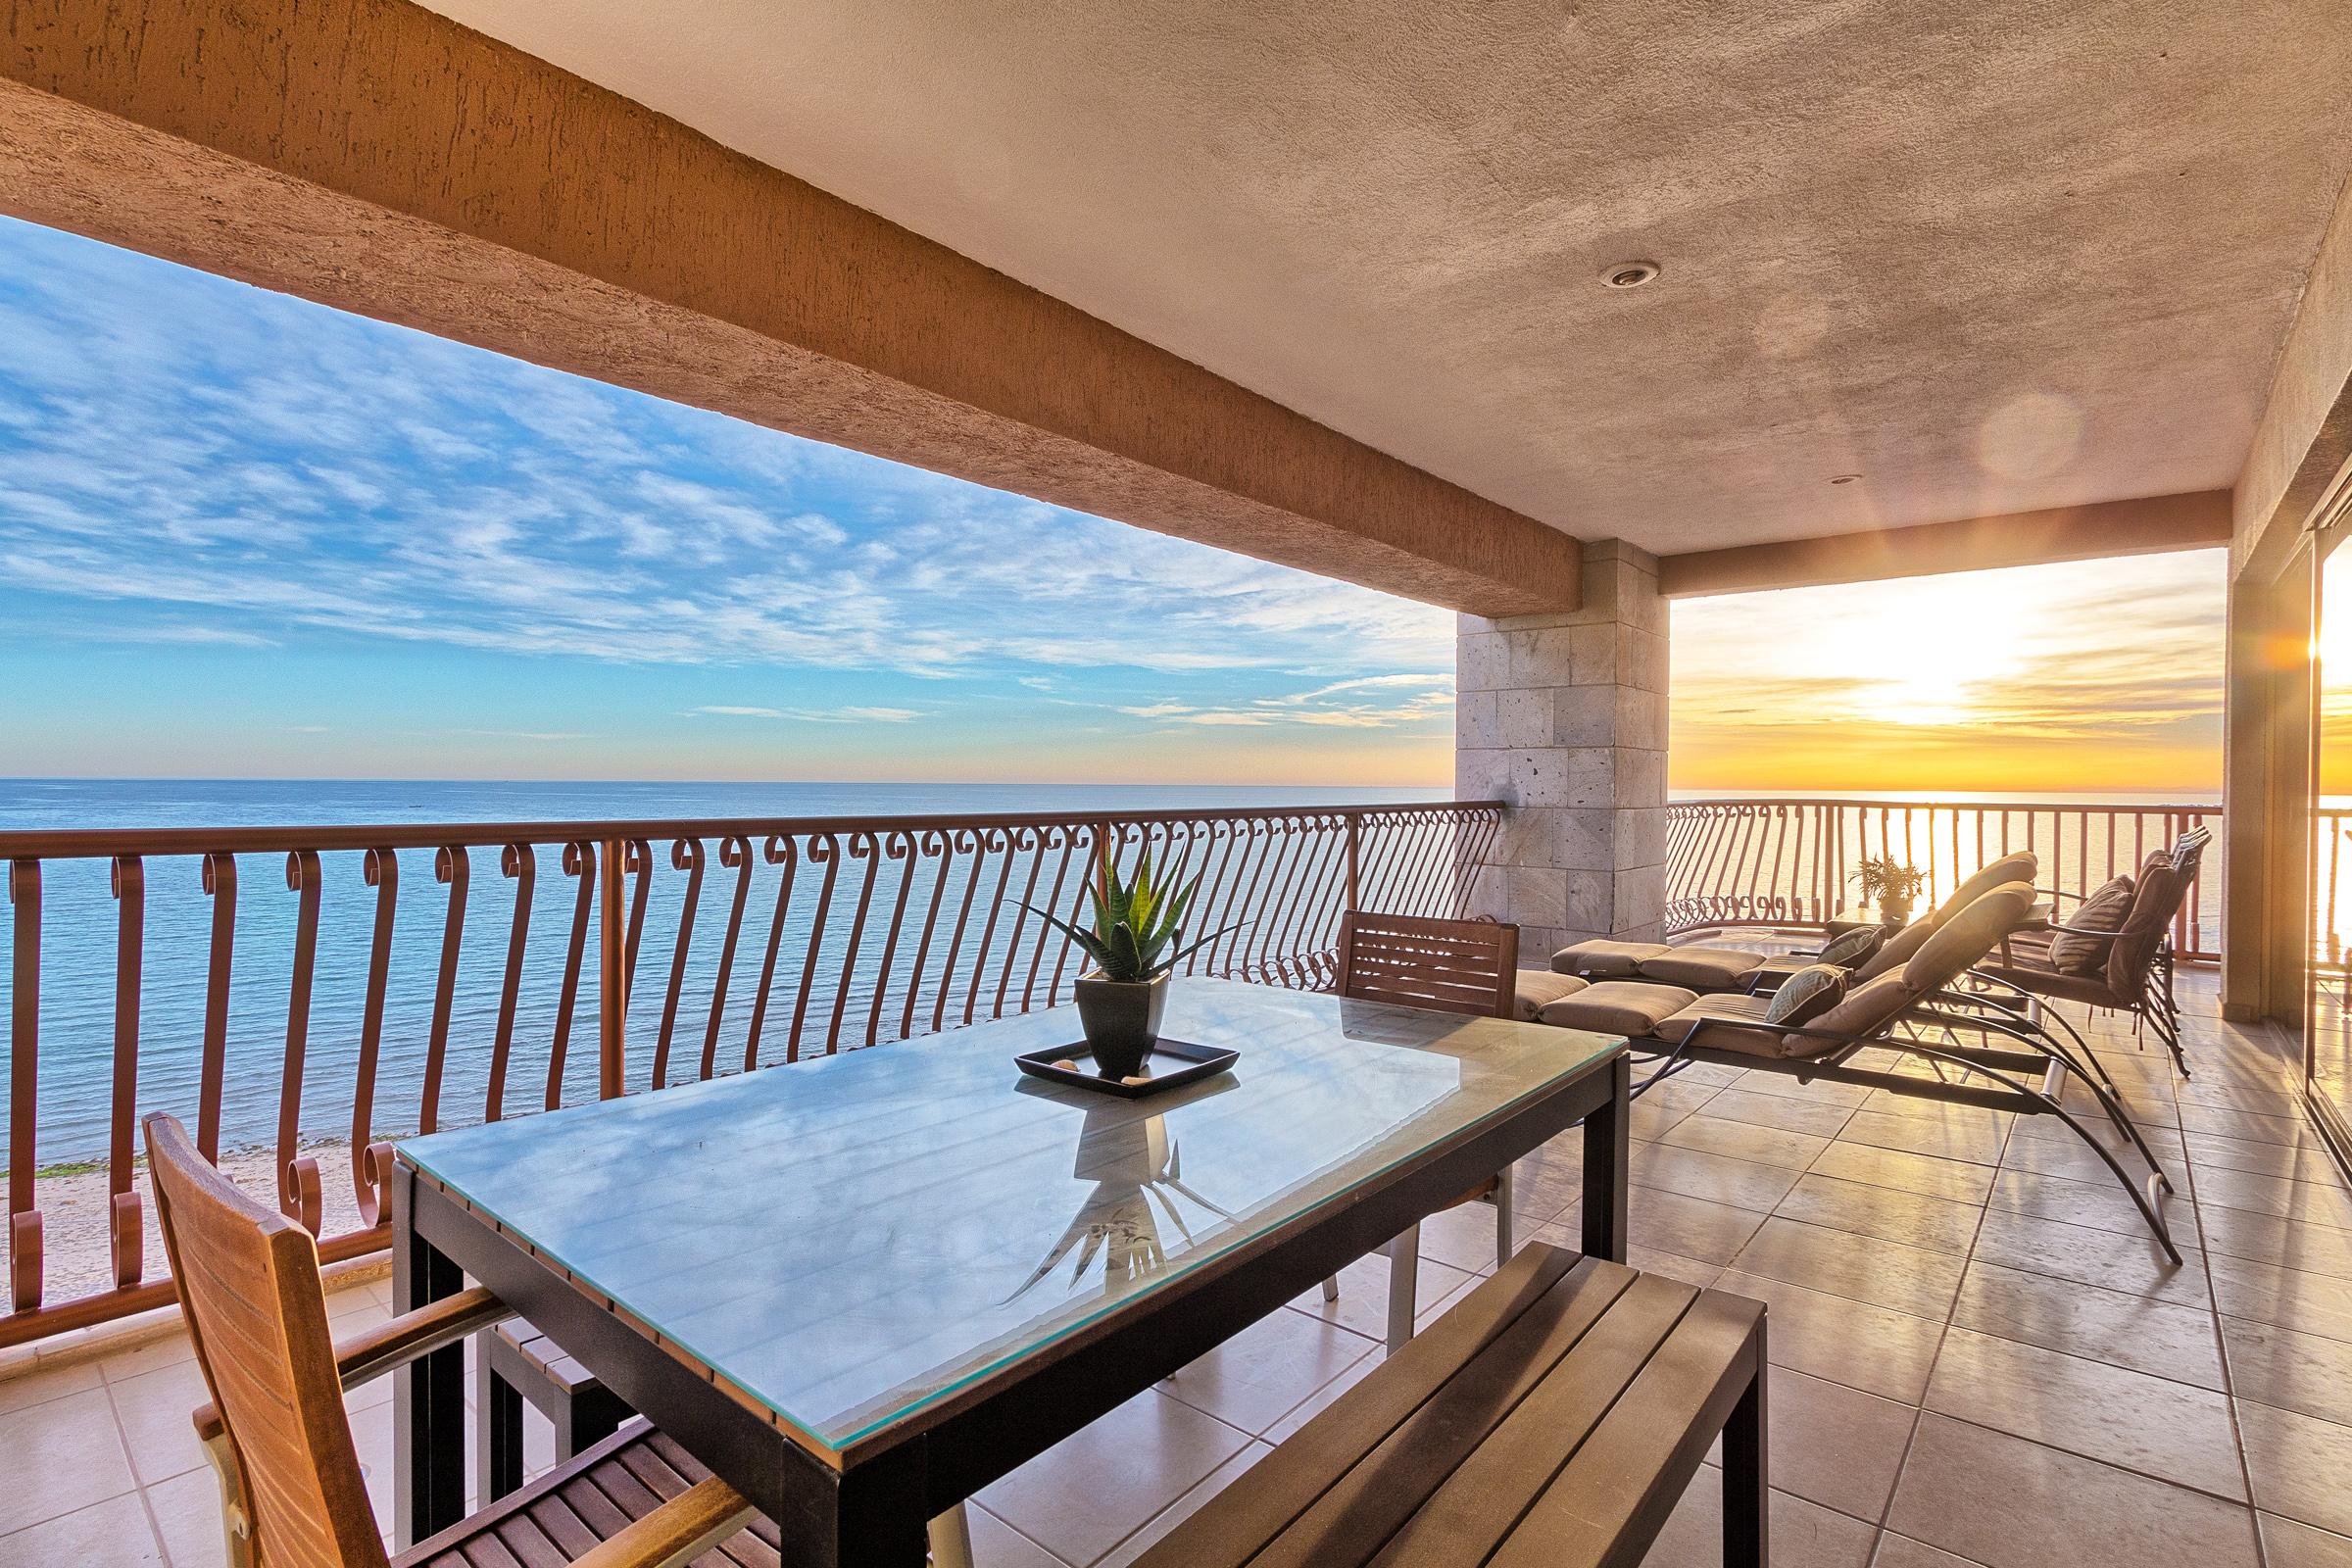 The Sonoran Sun Resort